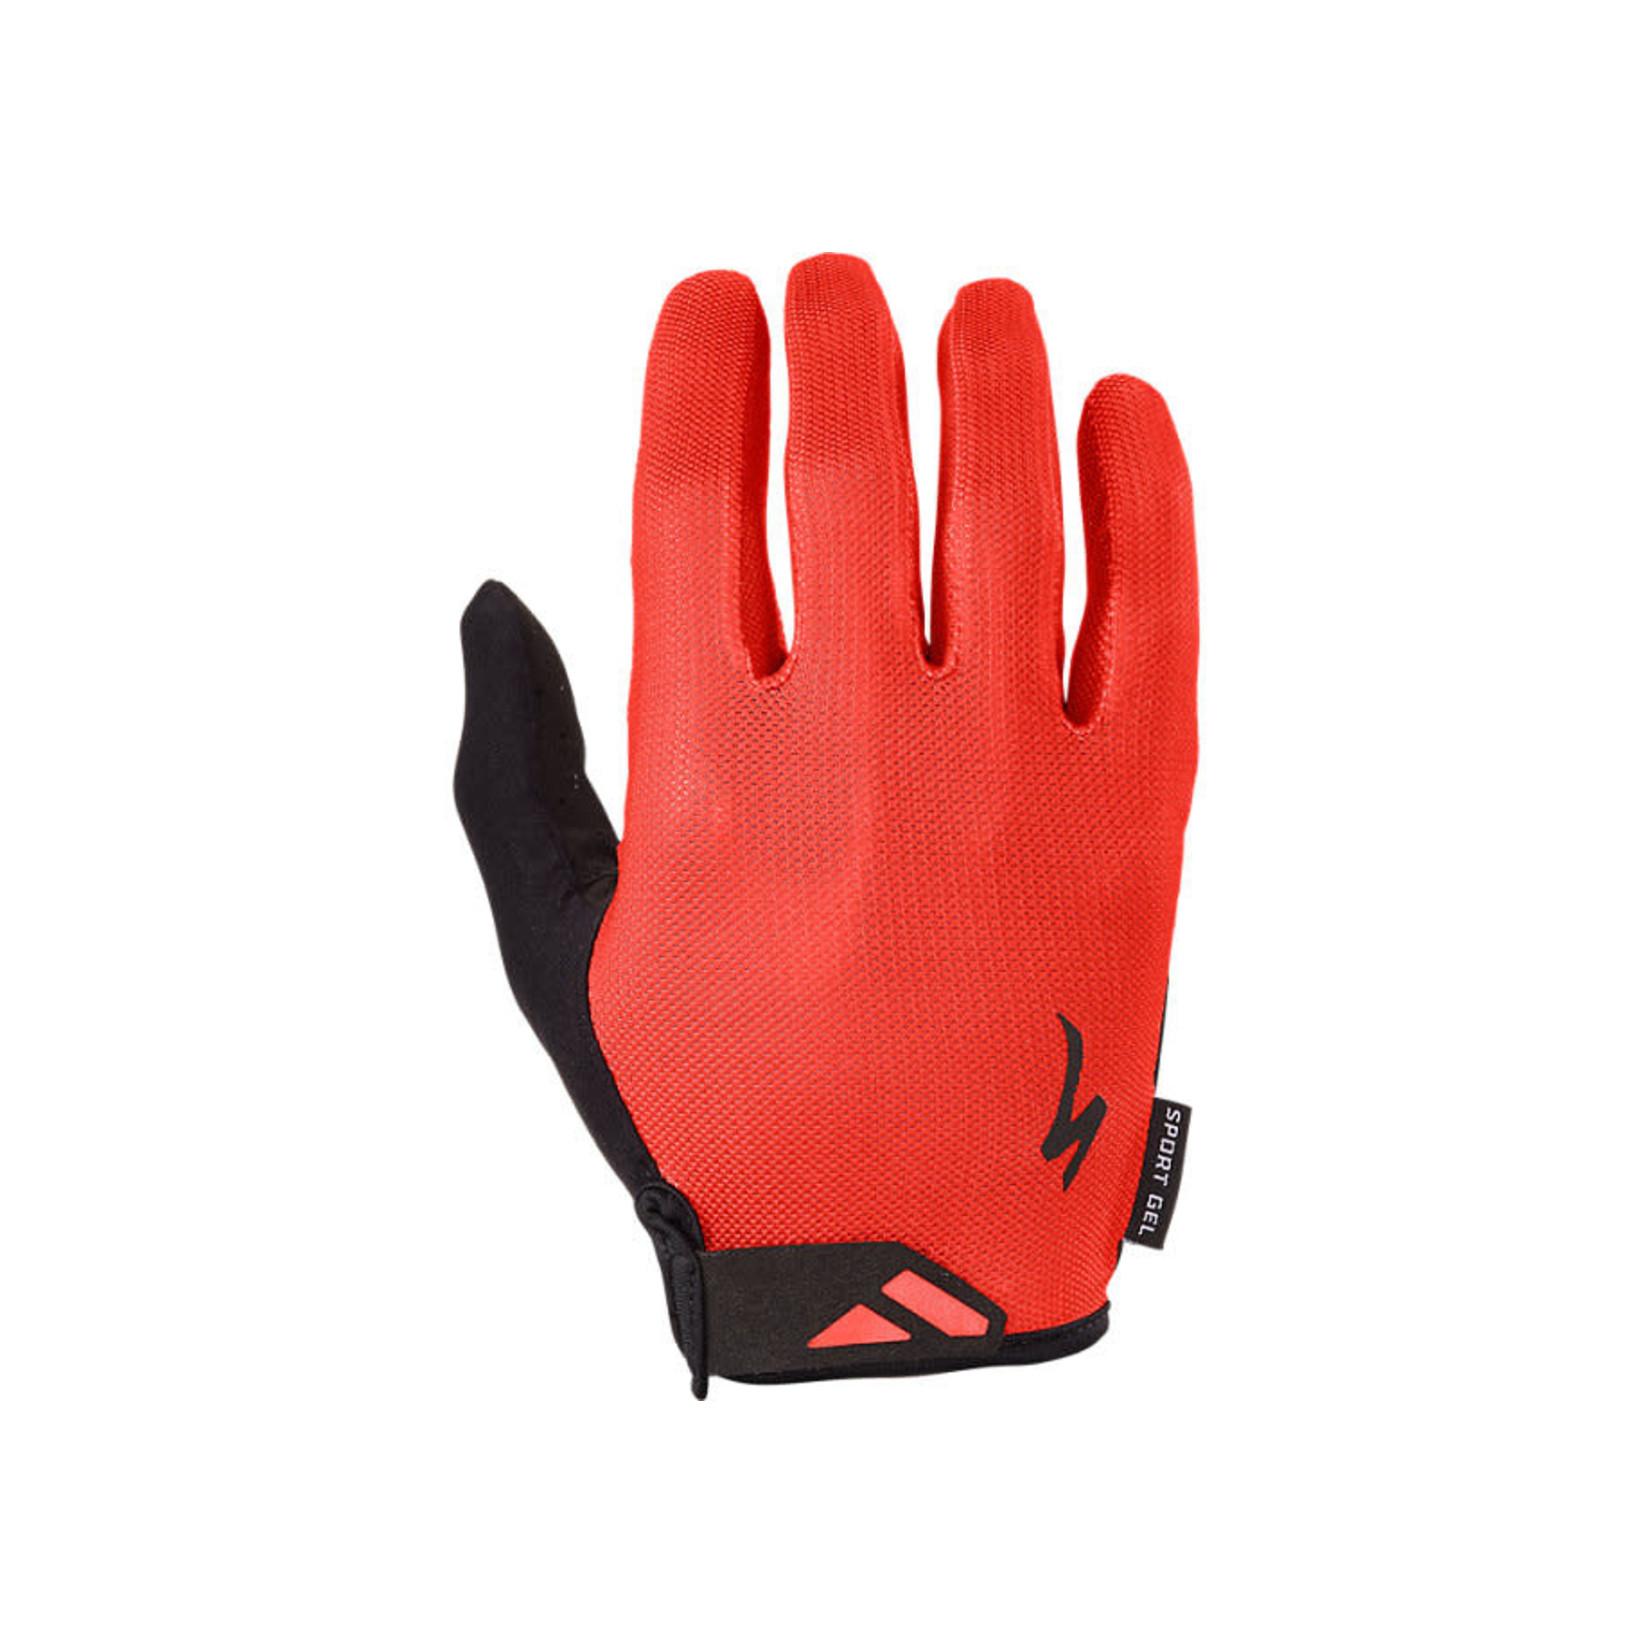 Specialized Specialized Men's BG Sport Gel LF Gloves